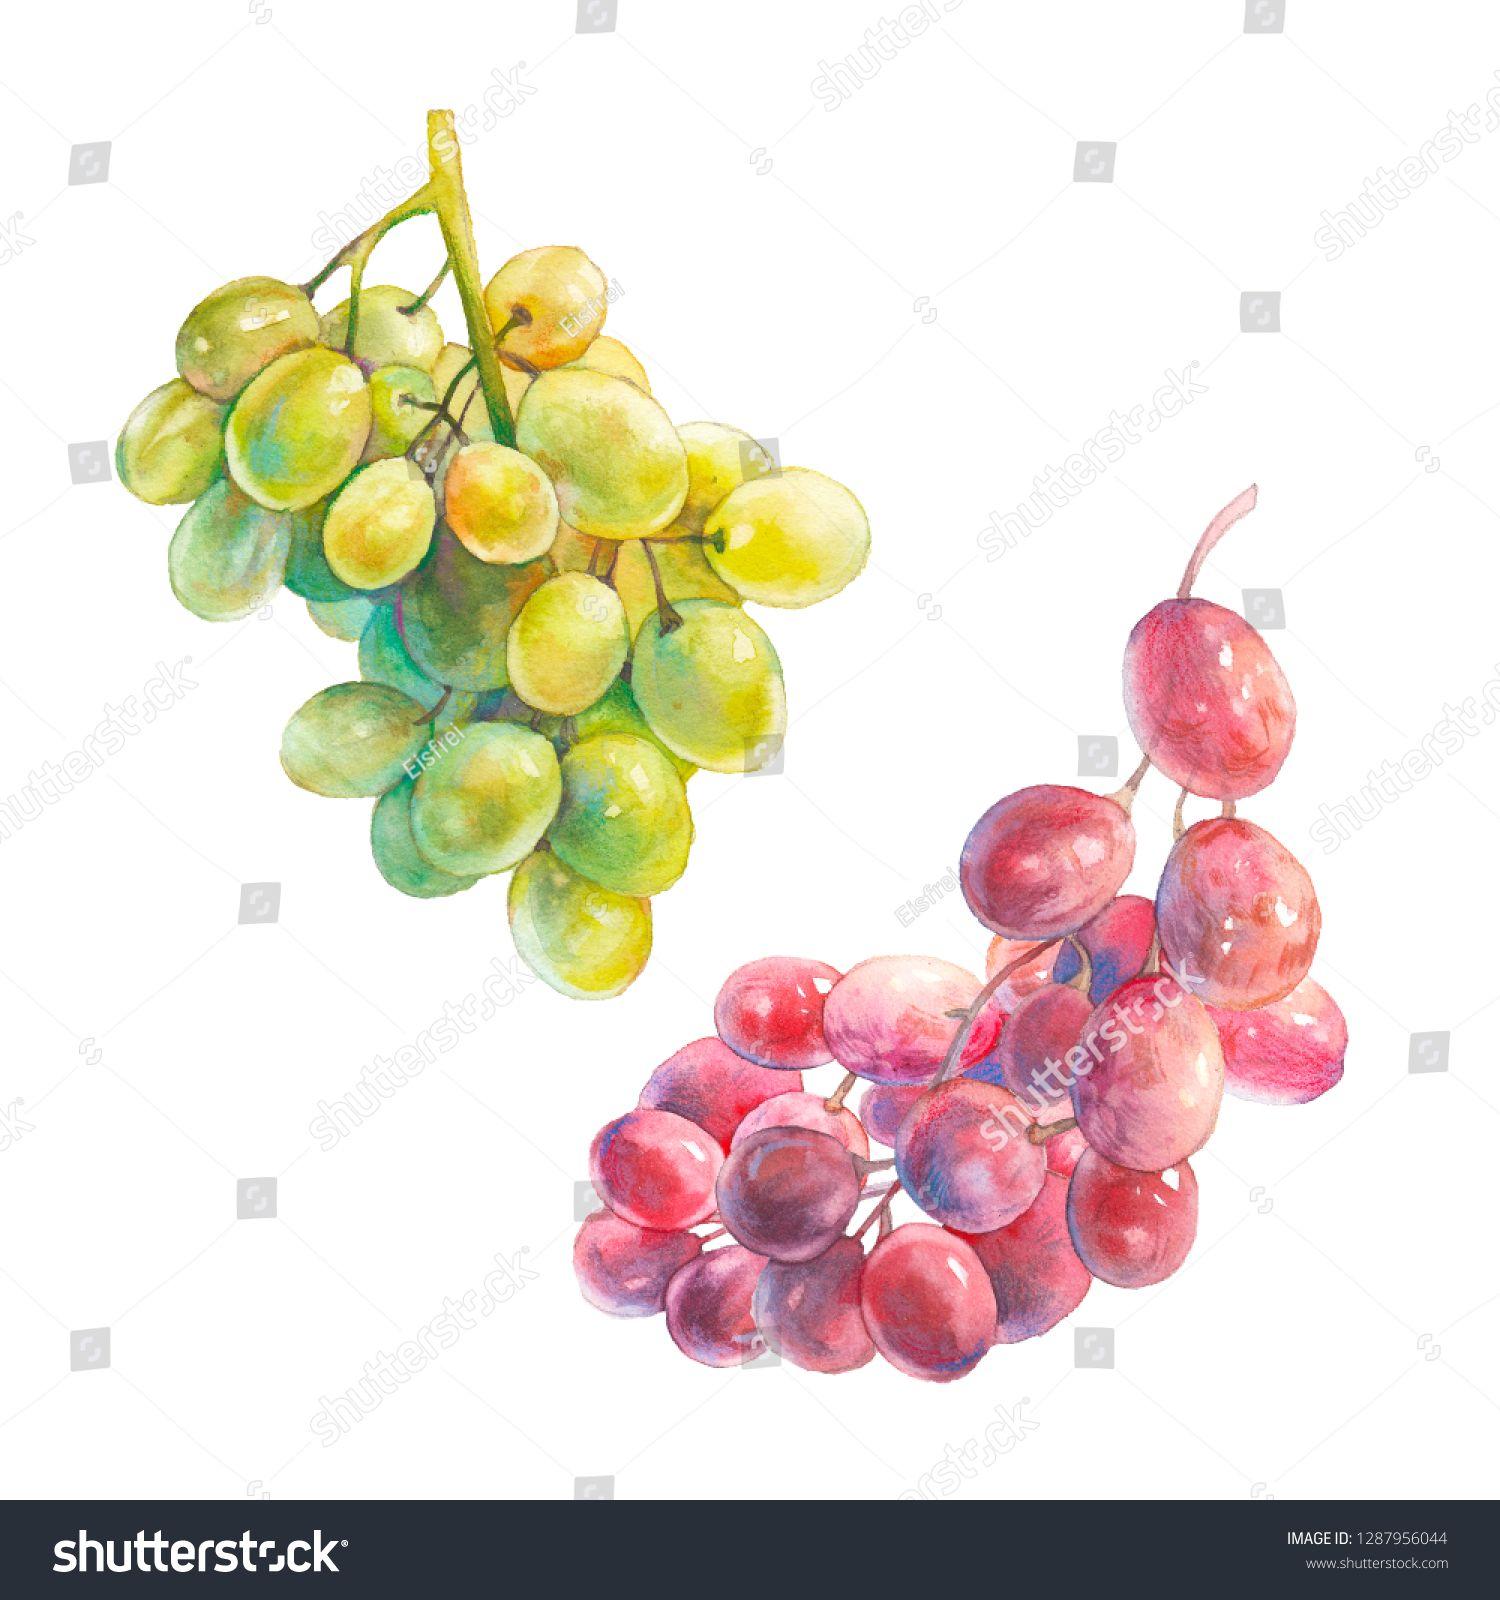 Green grapes-Original artwork-Gouache painting-Watercolor original-Grapes watercolor-Fruits watercolor-Wall art-Green grapes painting-8\u00d710